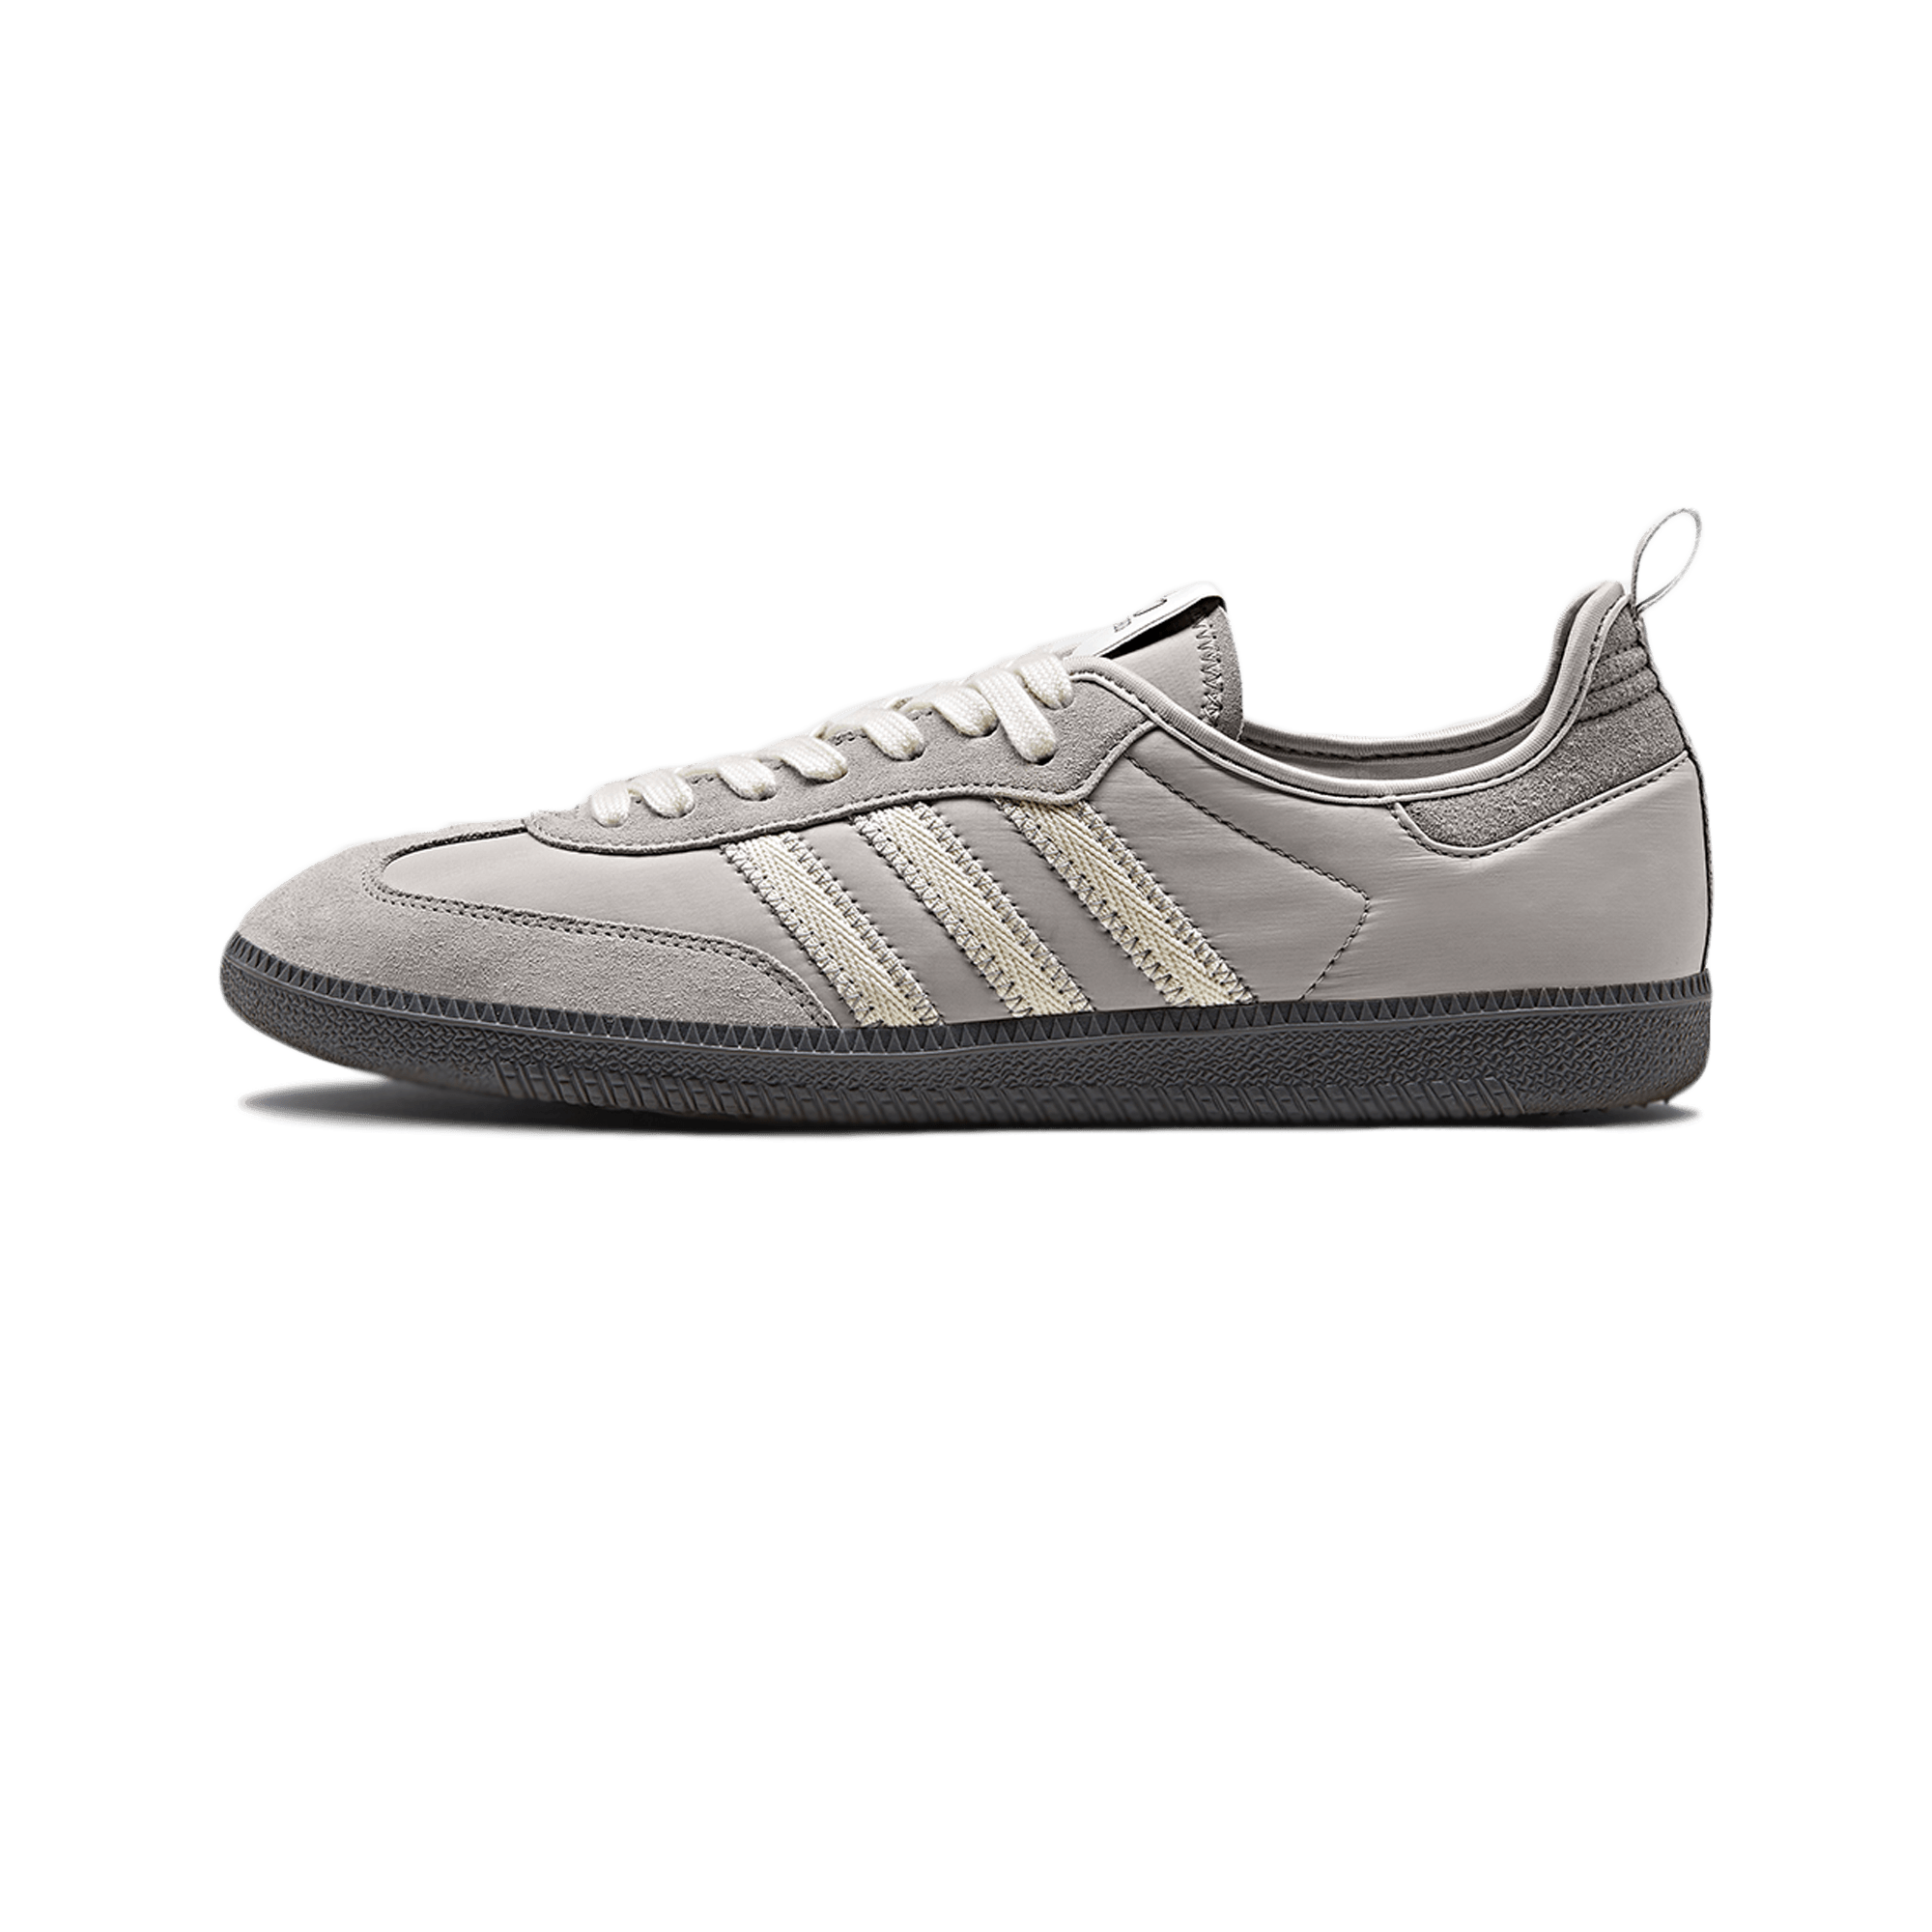 the latest 8afaf b1ea0 adidas Samba x C.P. Company clear granite / off white - Men |  Holypopstore.com